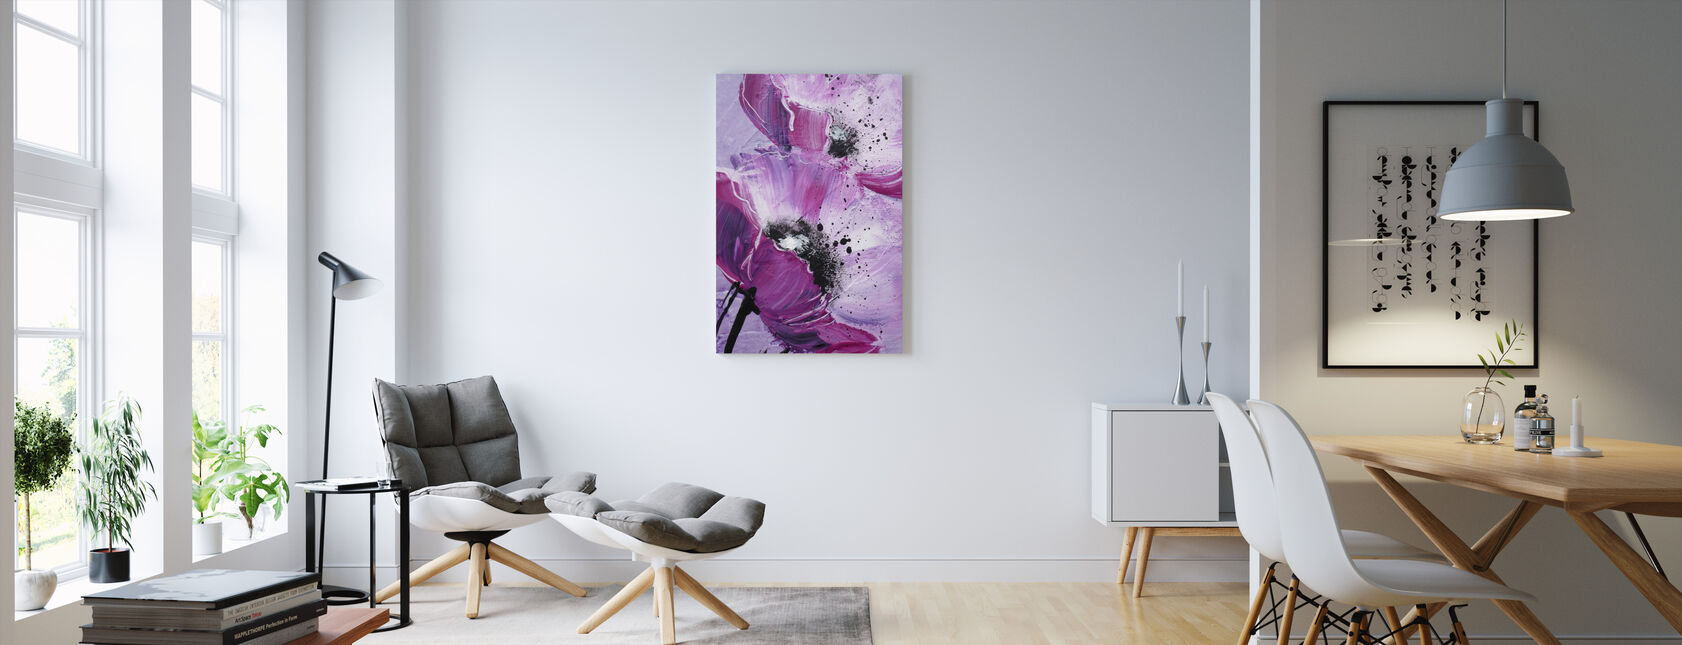 Lila Leinwandbilder – Leinwandbilder online – Photowall